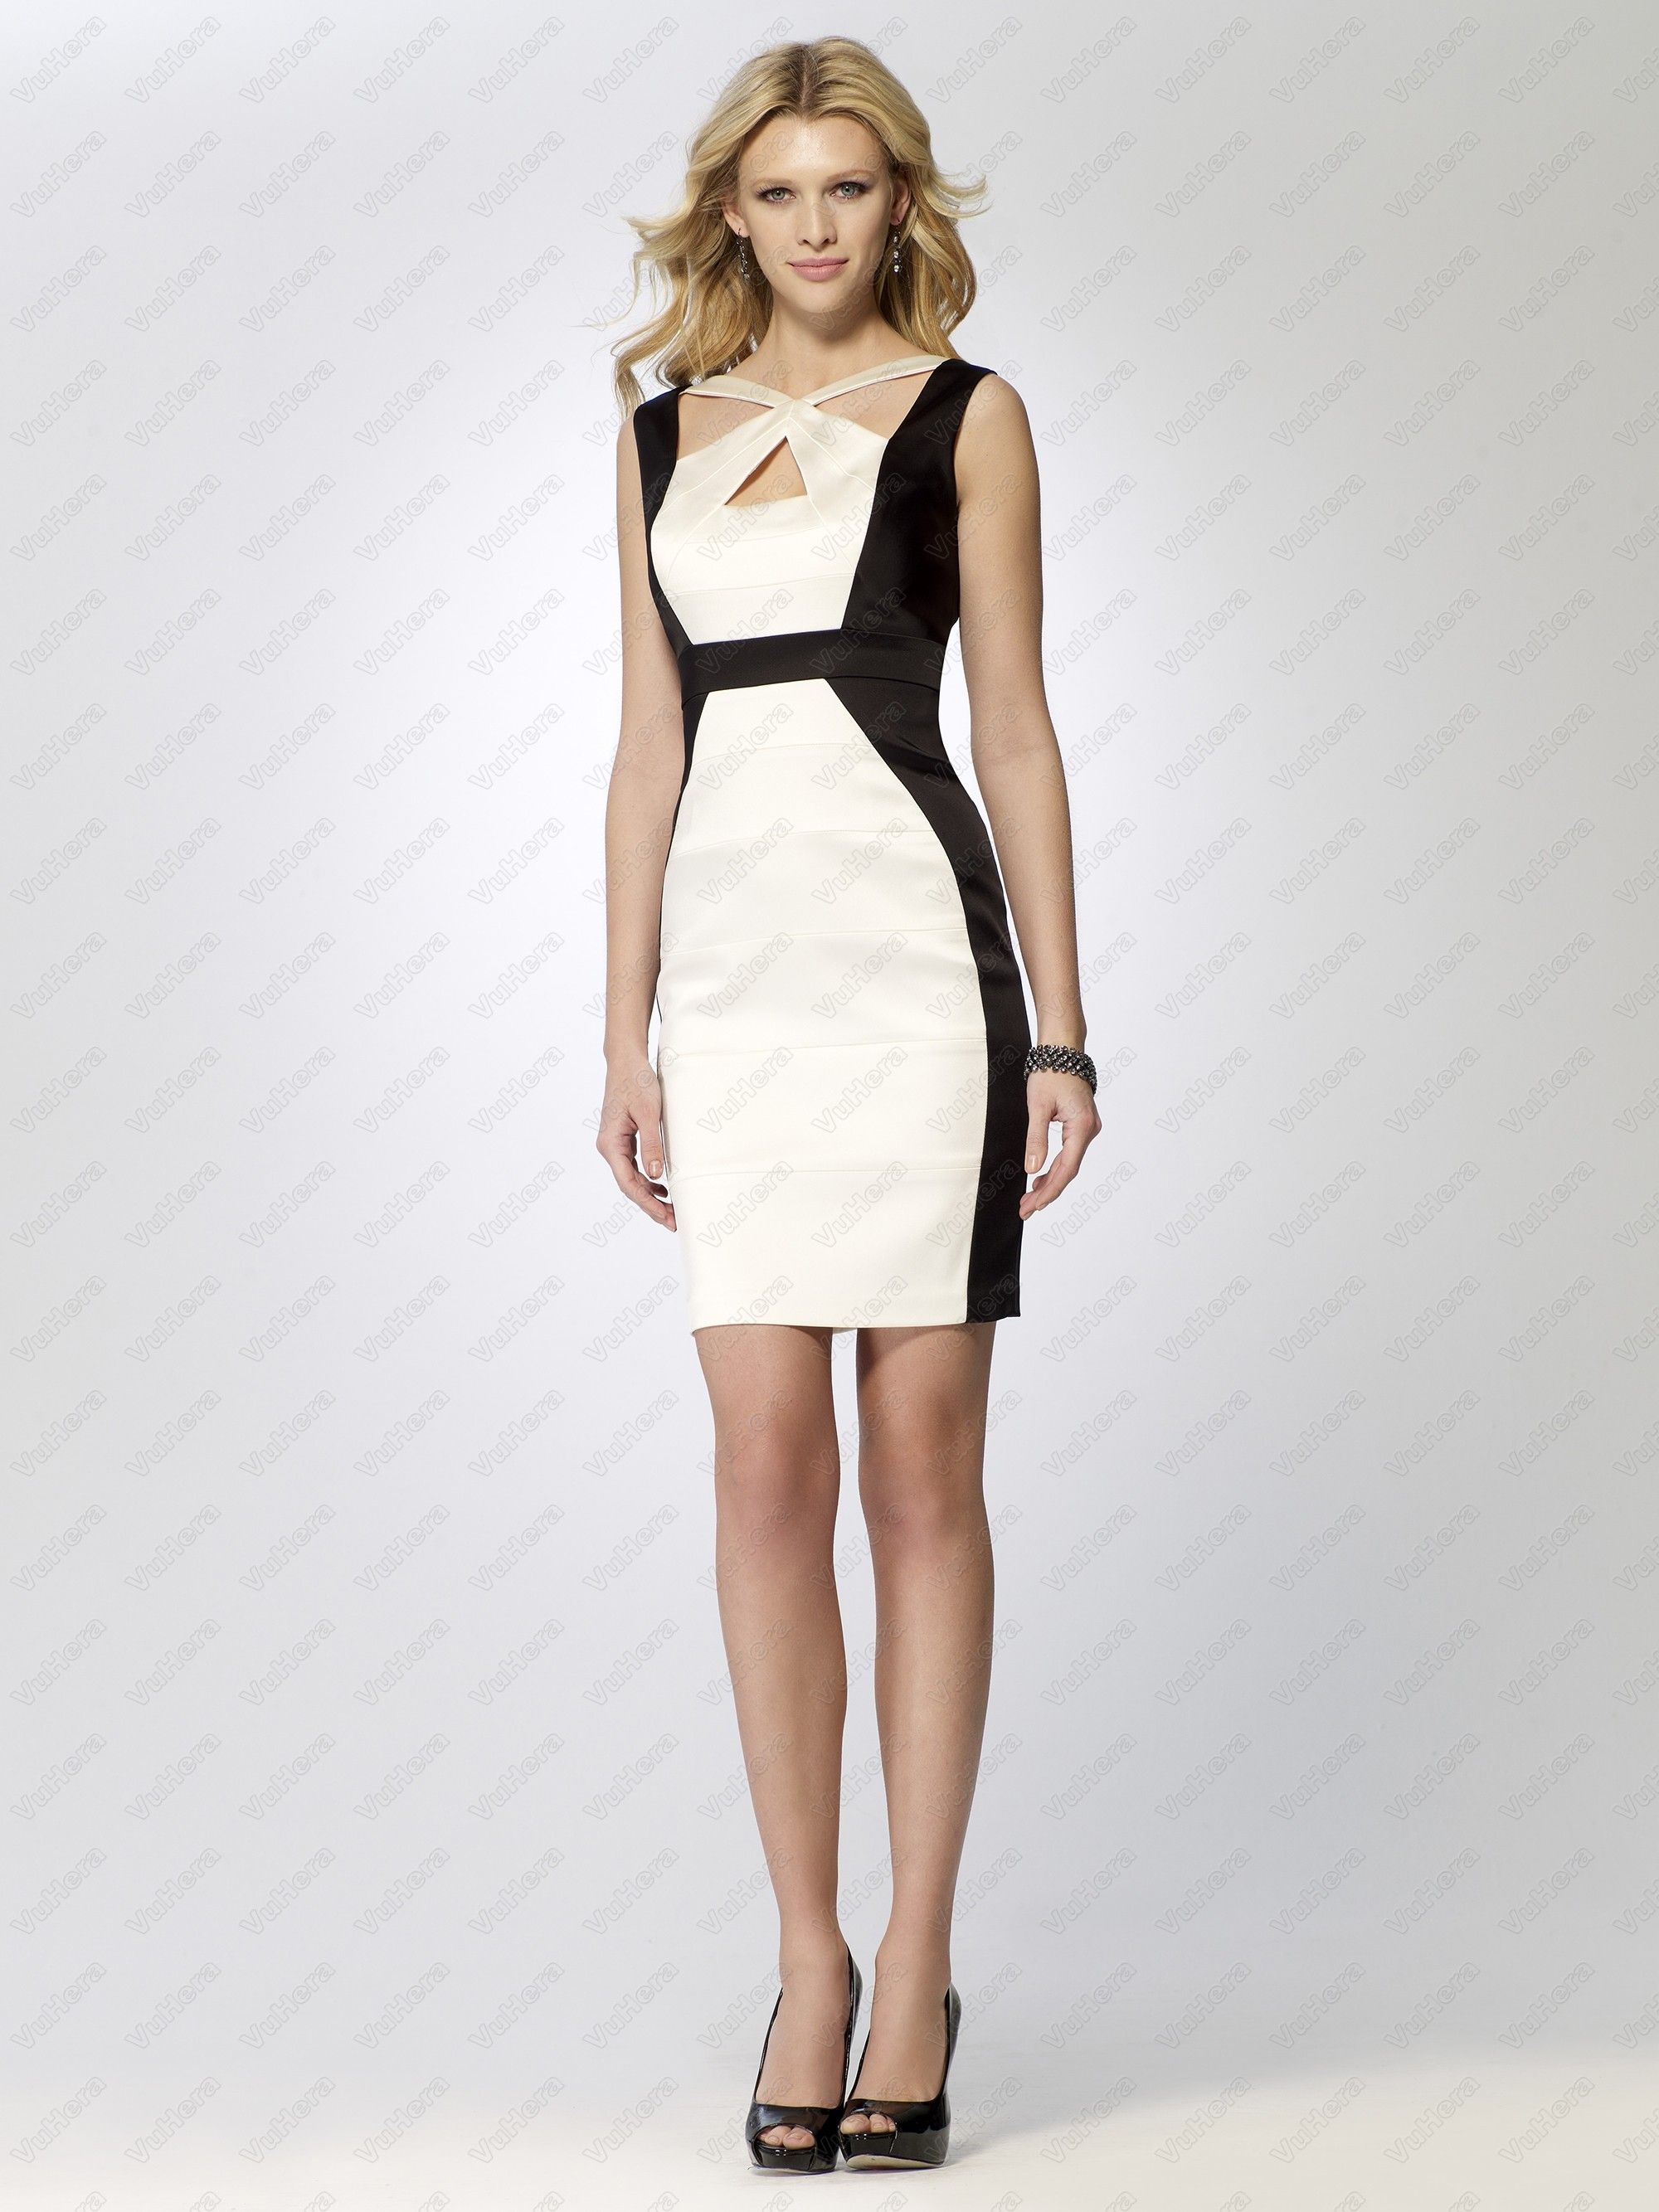 Stretch satin color block dress dress